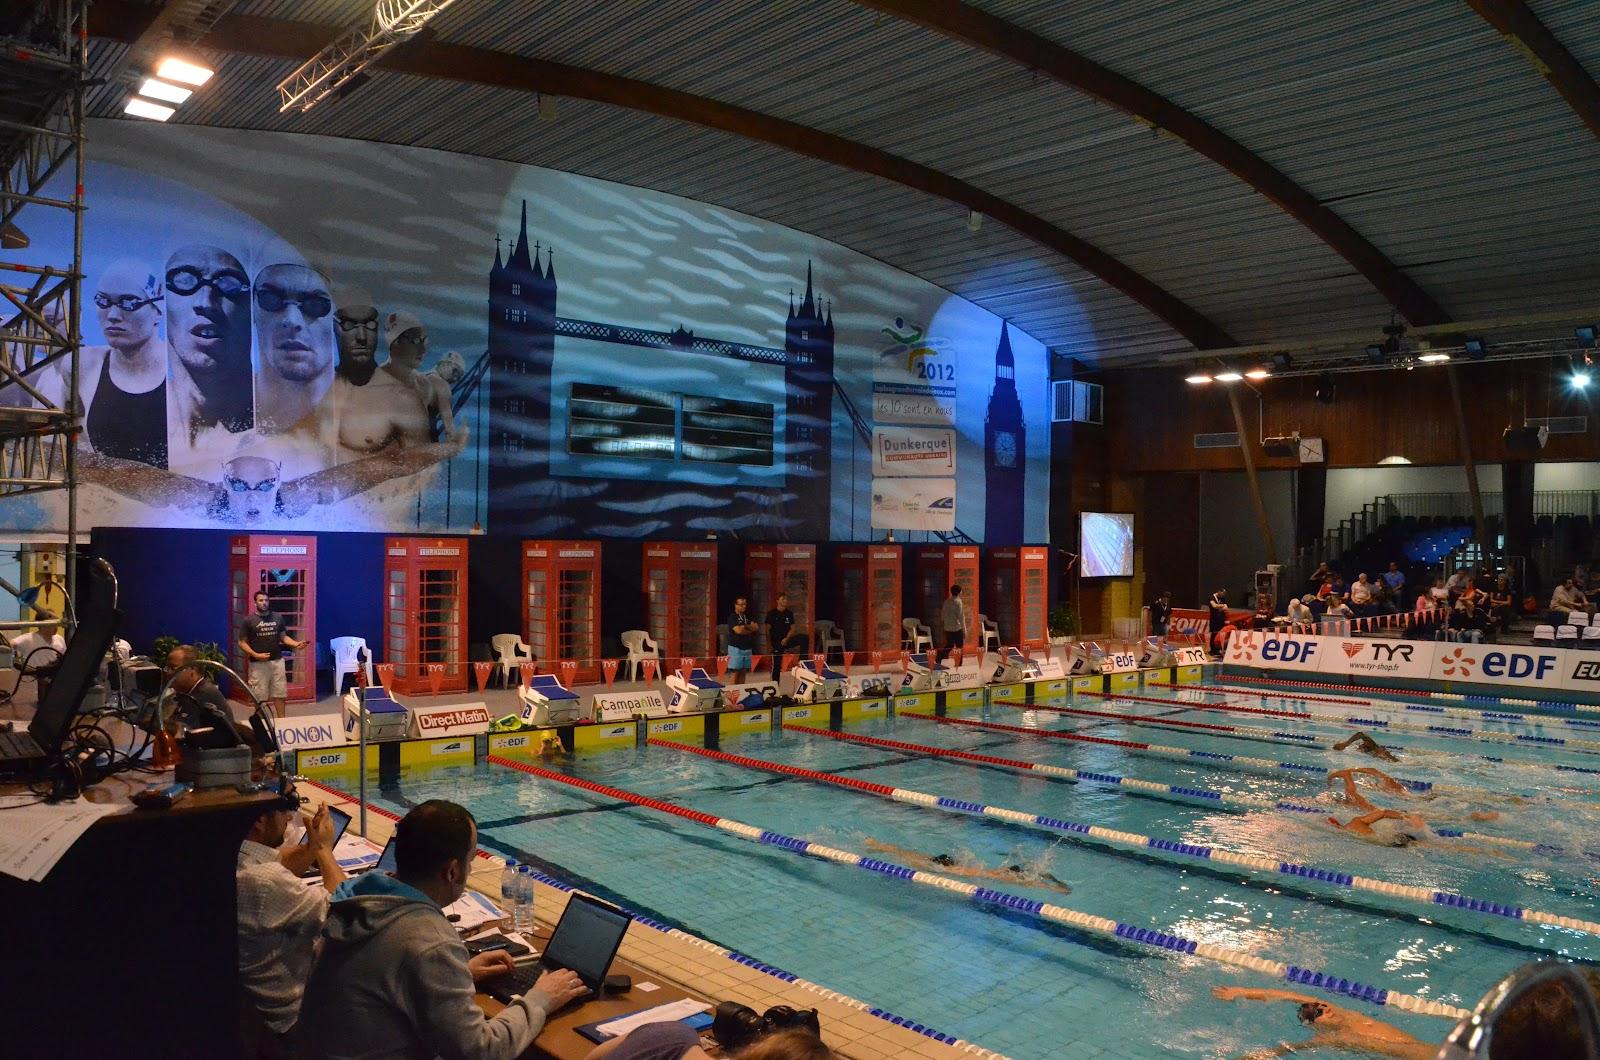 Spoportivement: Dunkerque… In The Place tout Piscine Paul Asseman